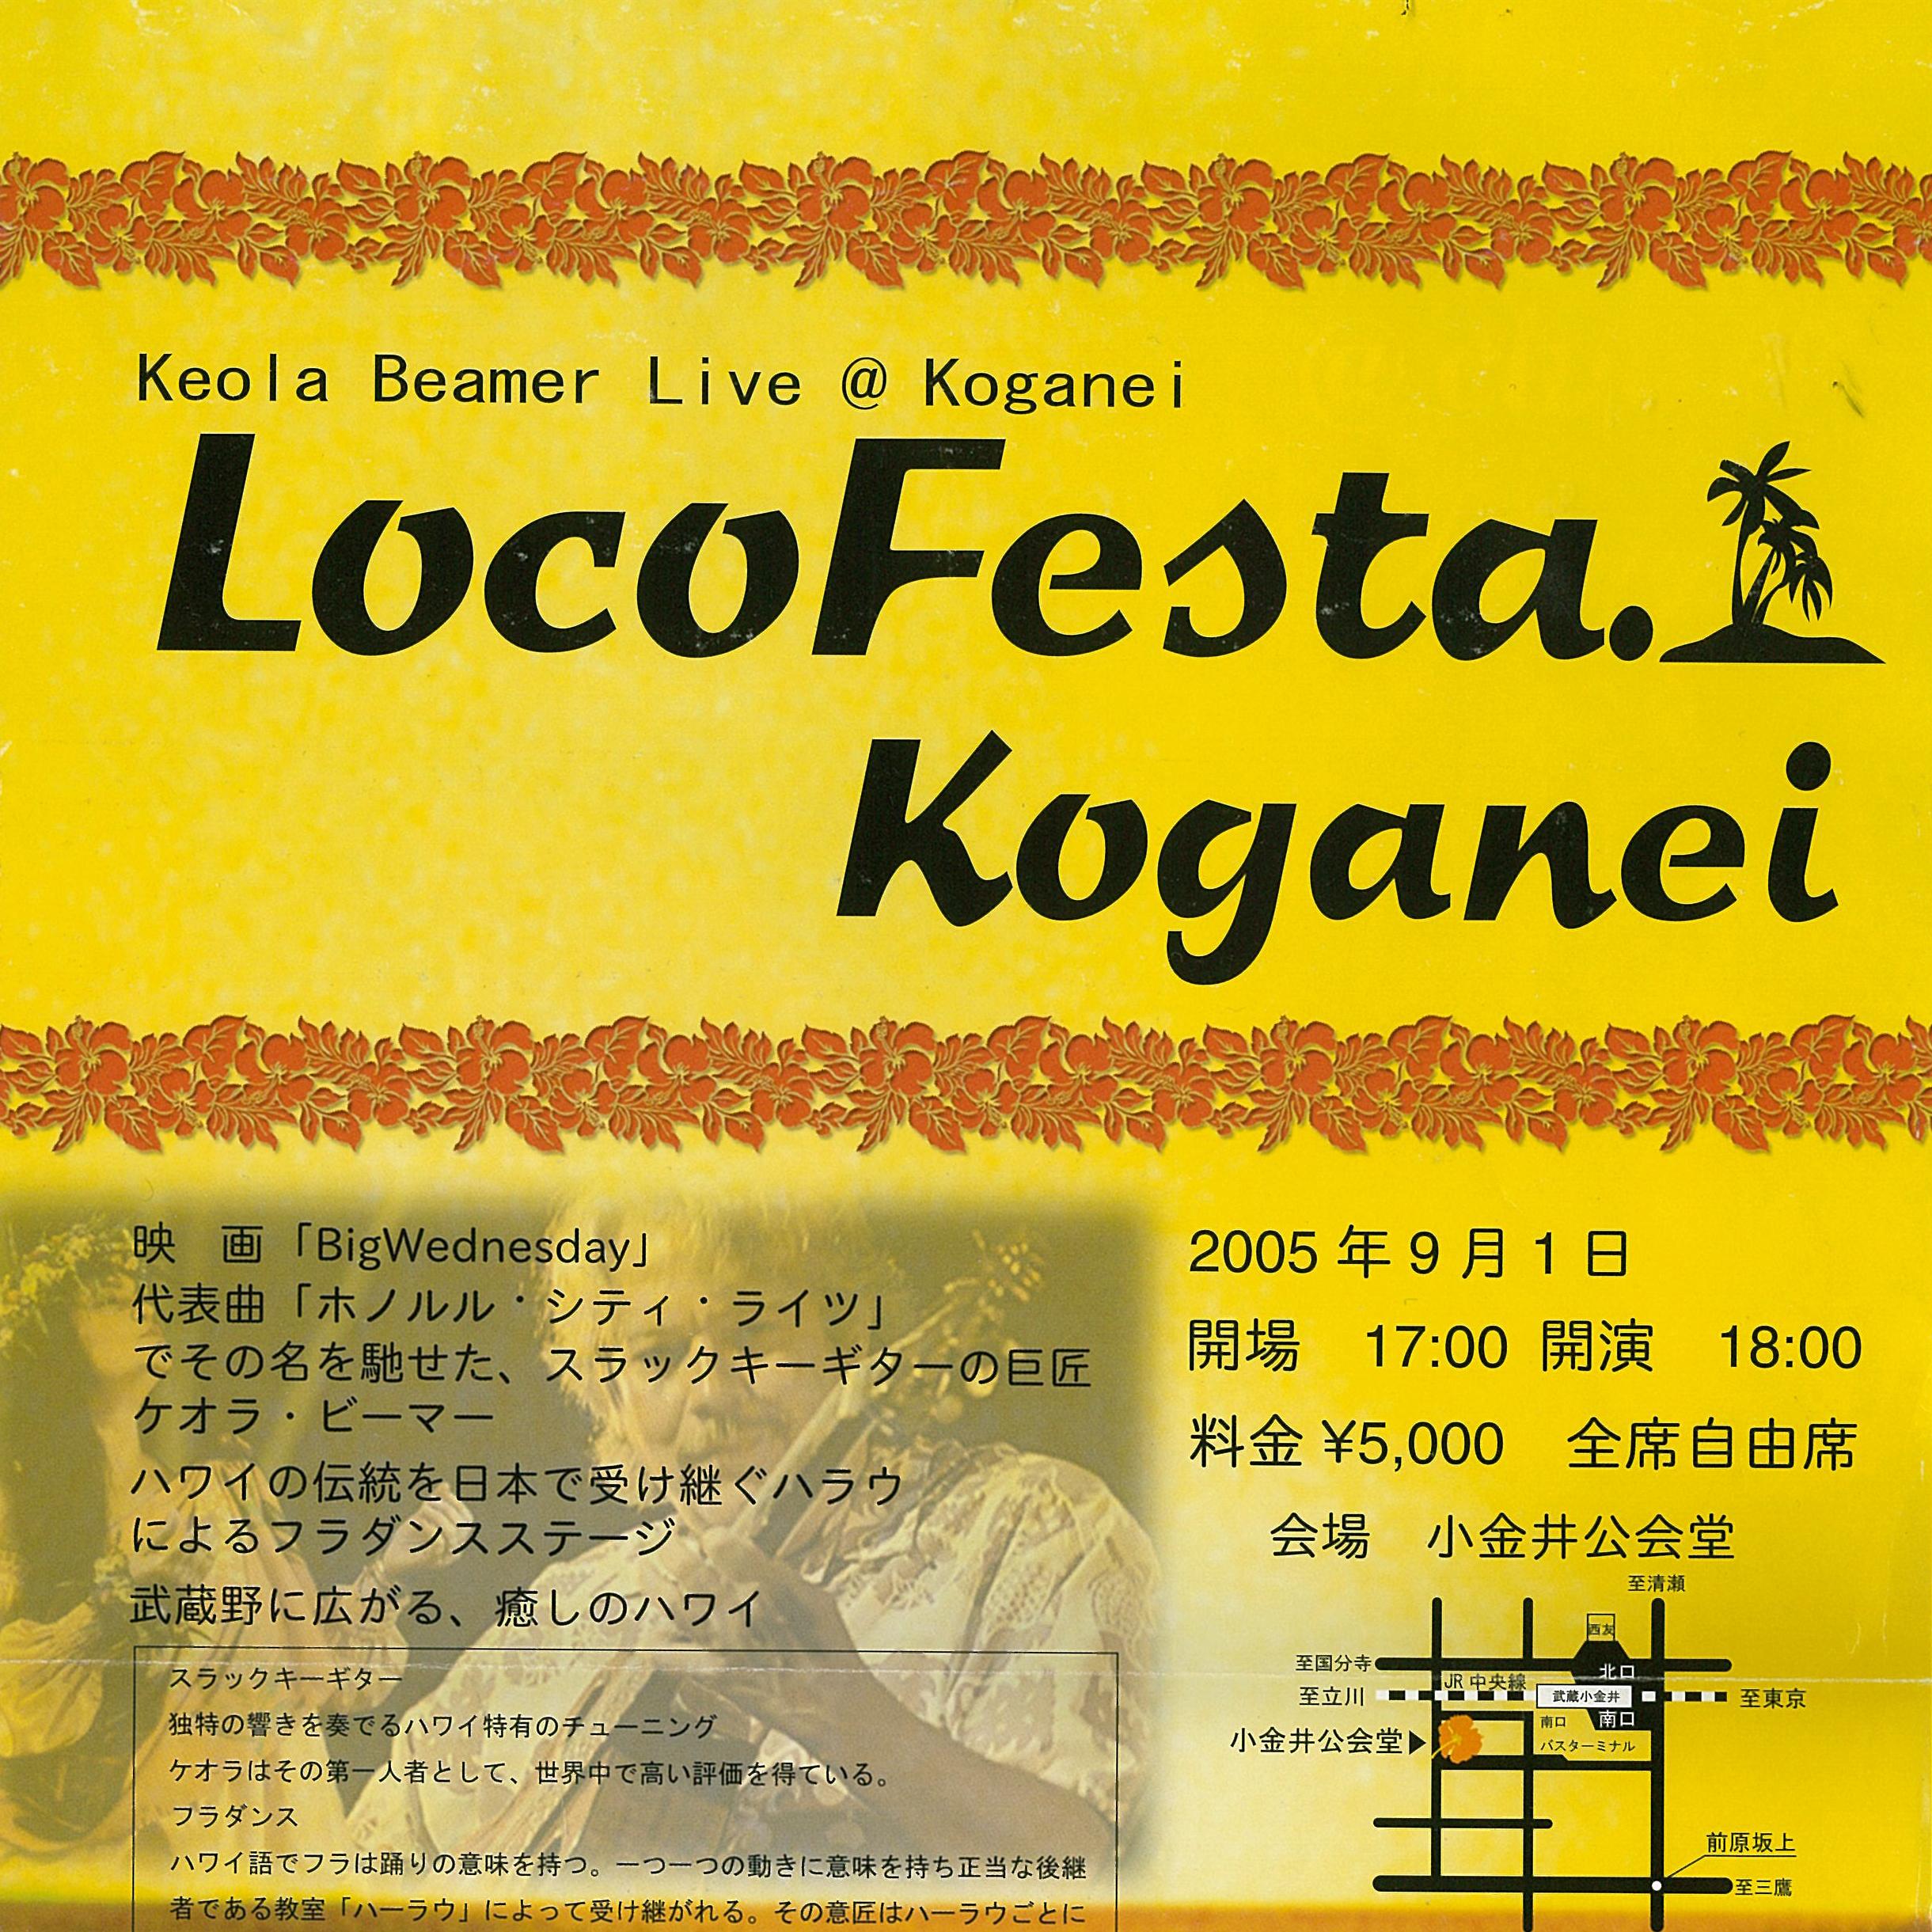 LocoFesta Vol.1 in 小金井市民会館